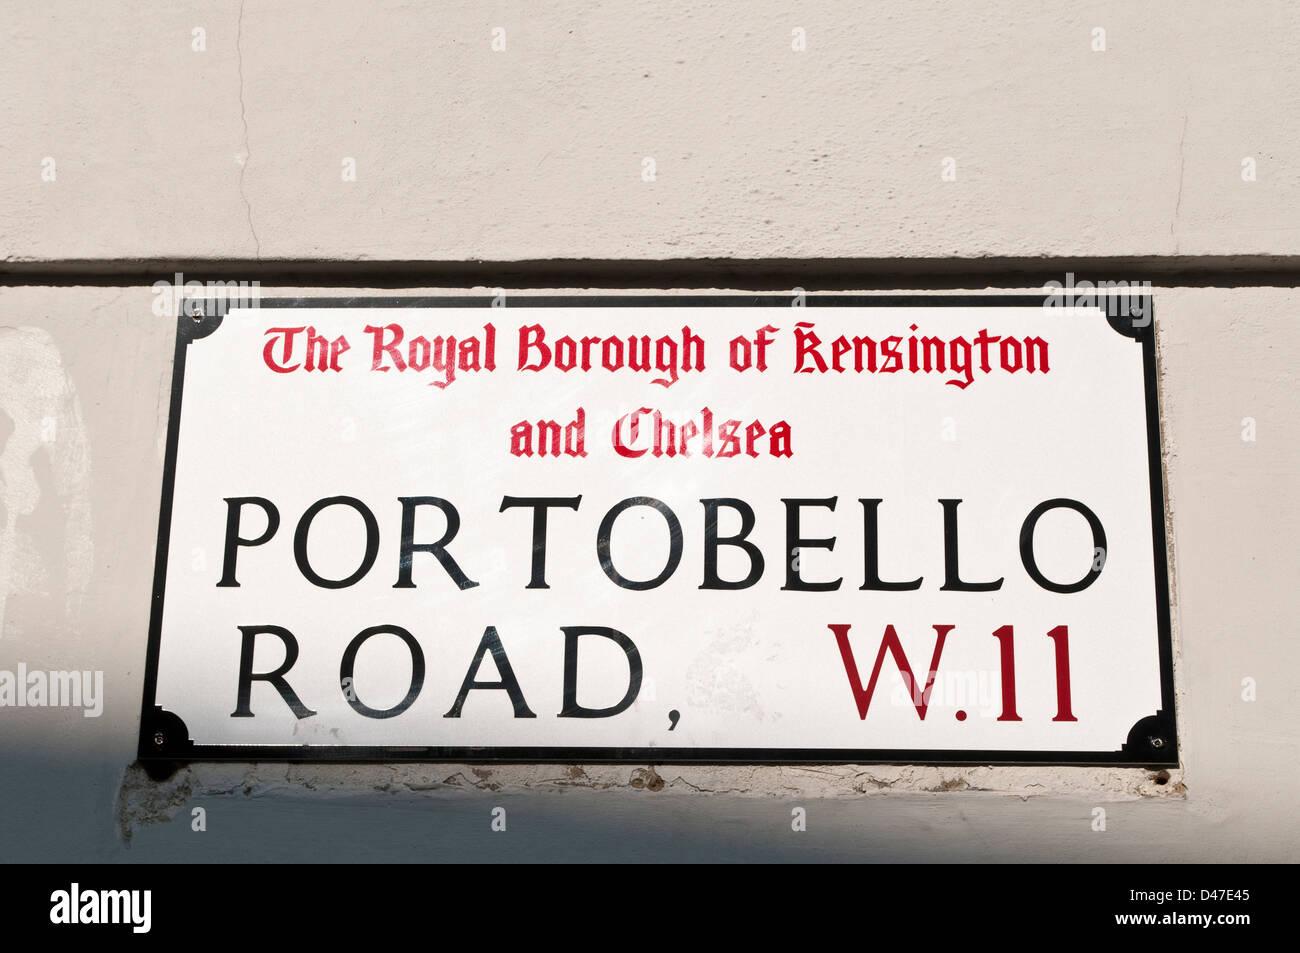 Portobello Road street plaque, Notting Hill, London, W11, UK - Stock Image